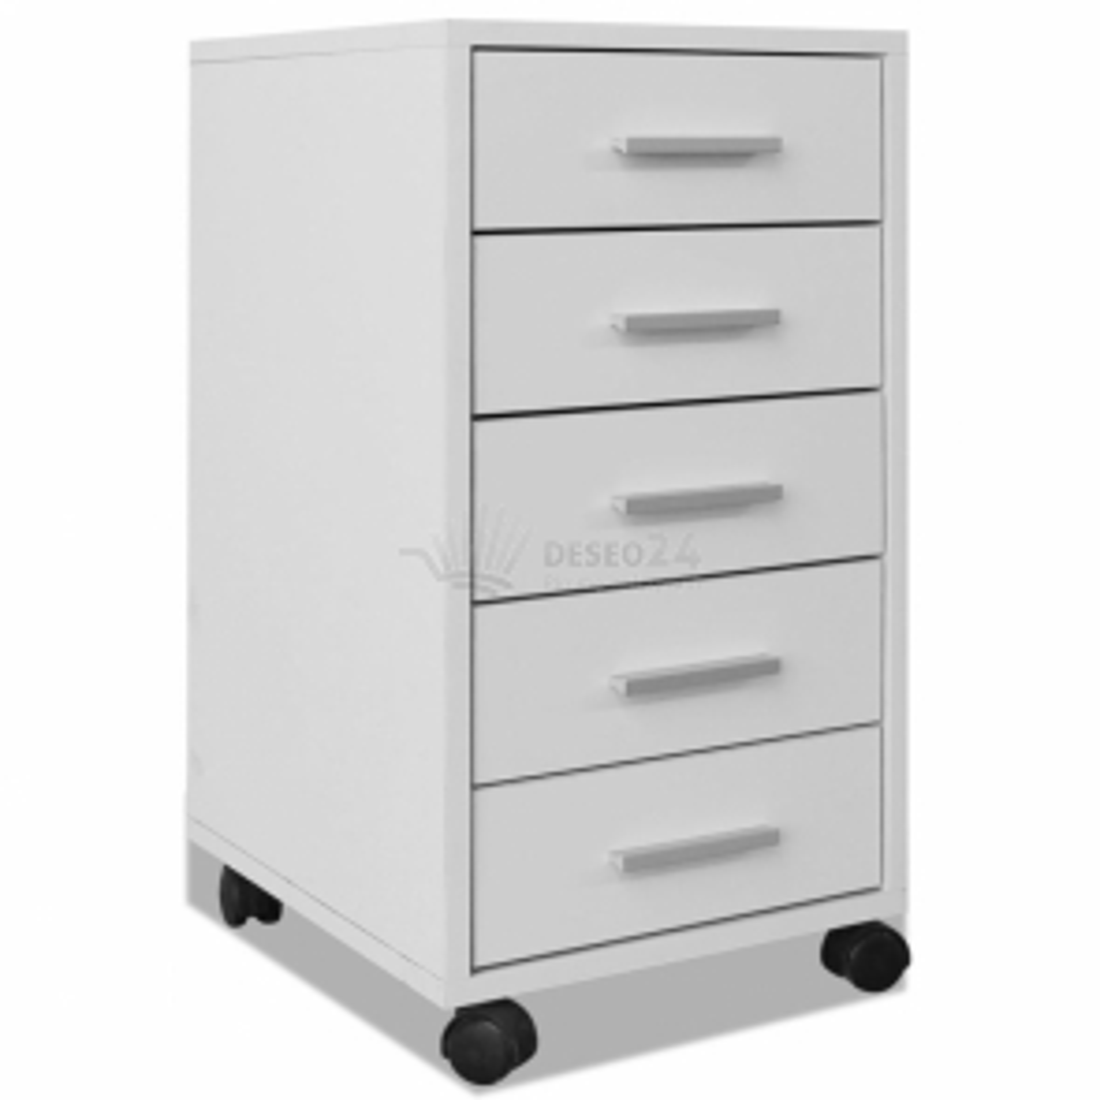 vidaXL Kancelářský zásuvkový díl s kolečky 5 zásuvek bílý [243064]